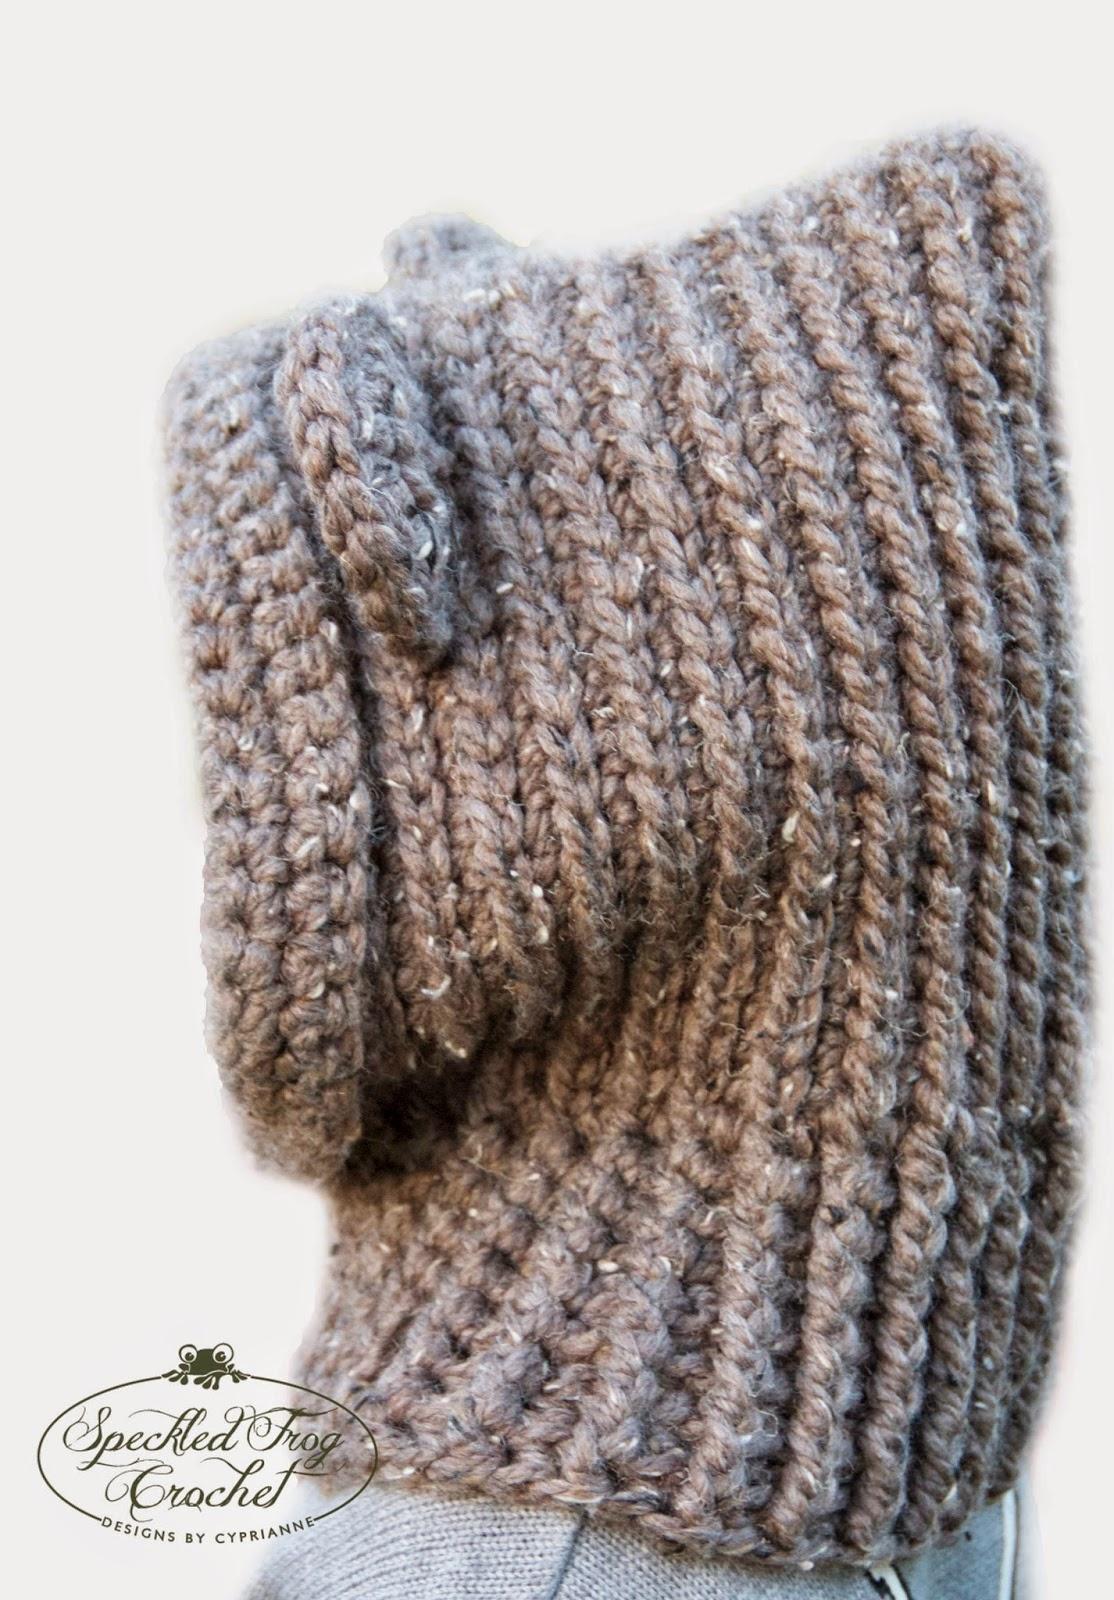 Hooded Cowl Knitting Pattern Free : Pretty darn adorable crochet hooded bear cowl pattern